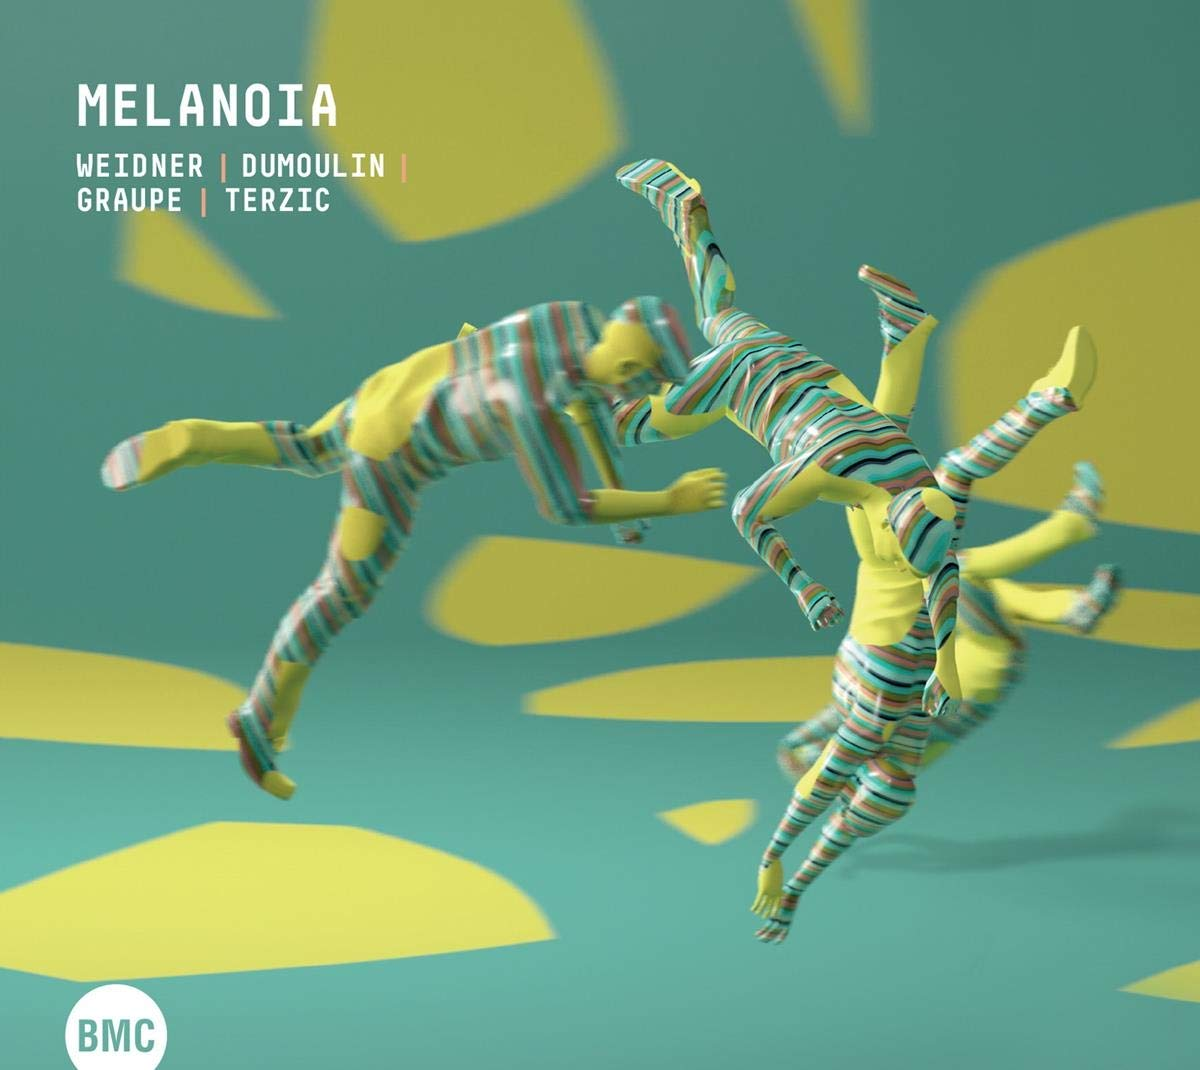 DEJAN TERZIĆ - Melanoia : Weidner | Dumoulin | Graupe | Terzic cover